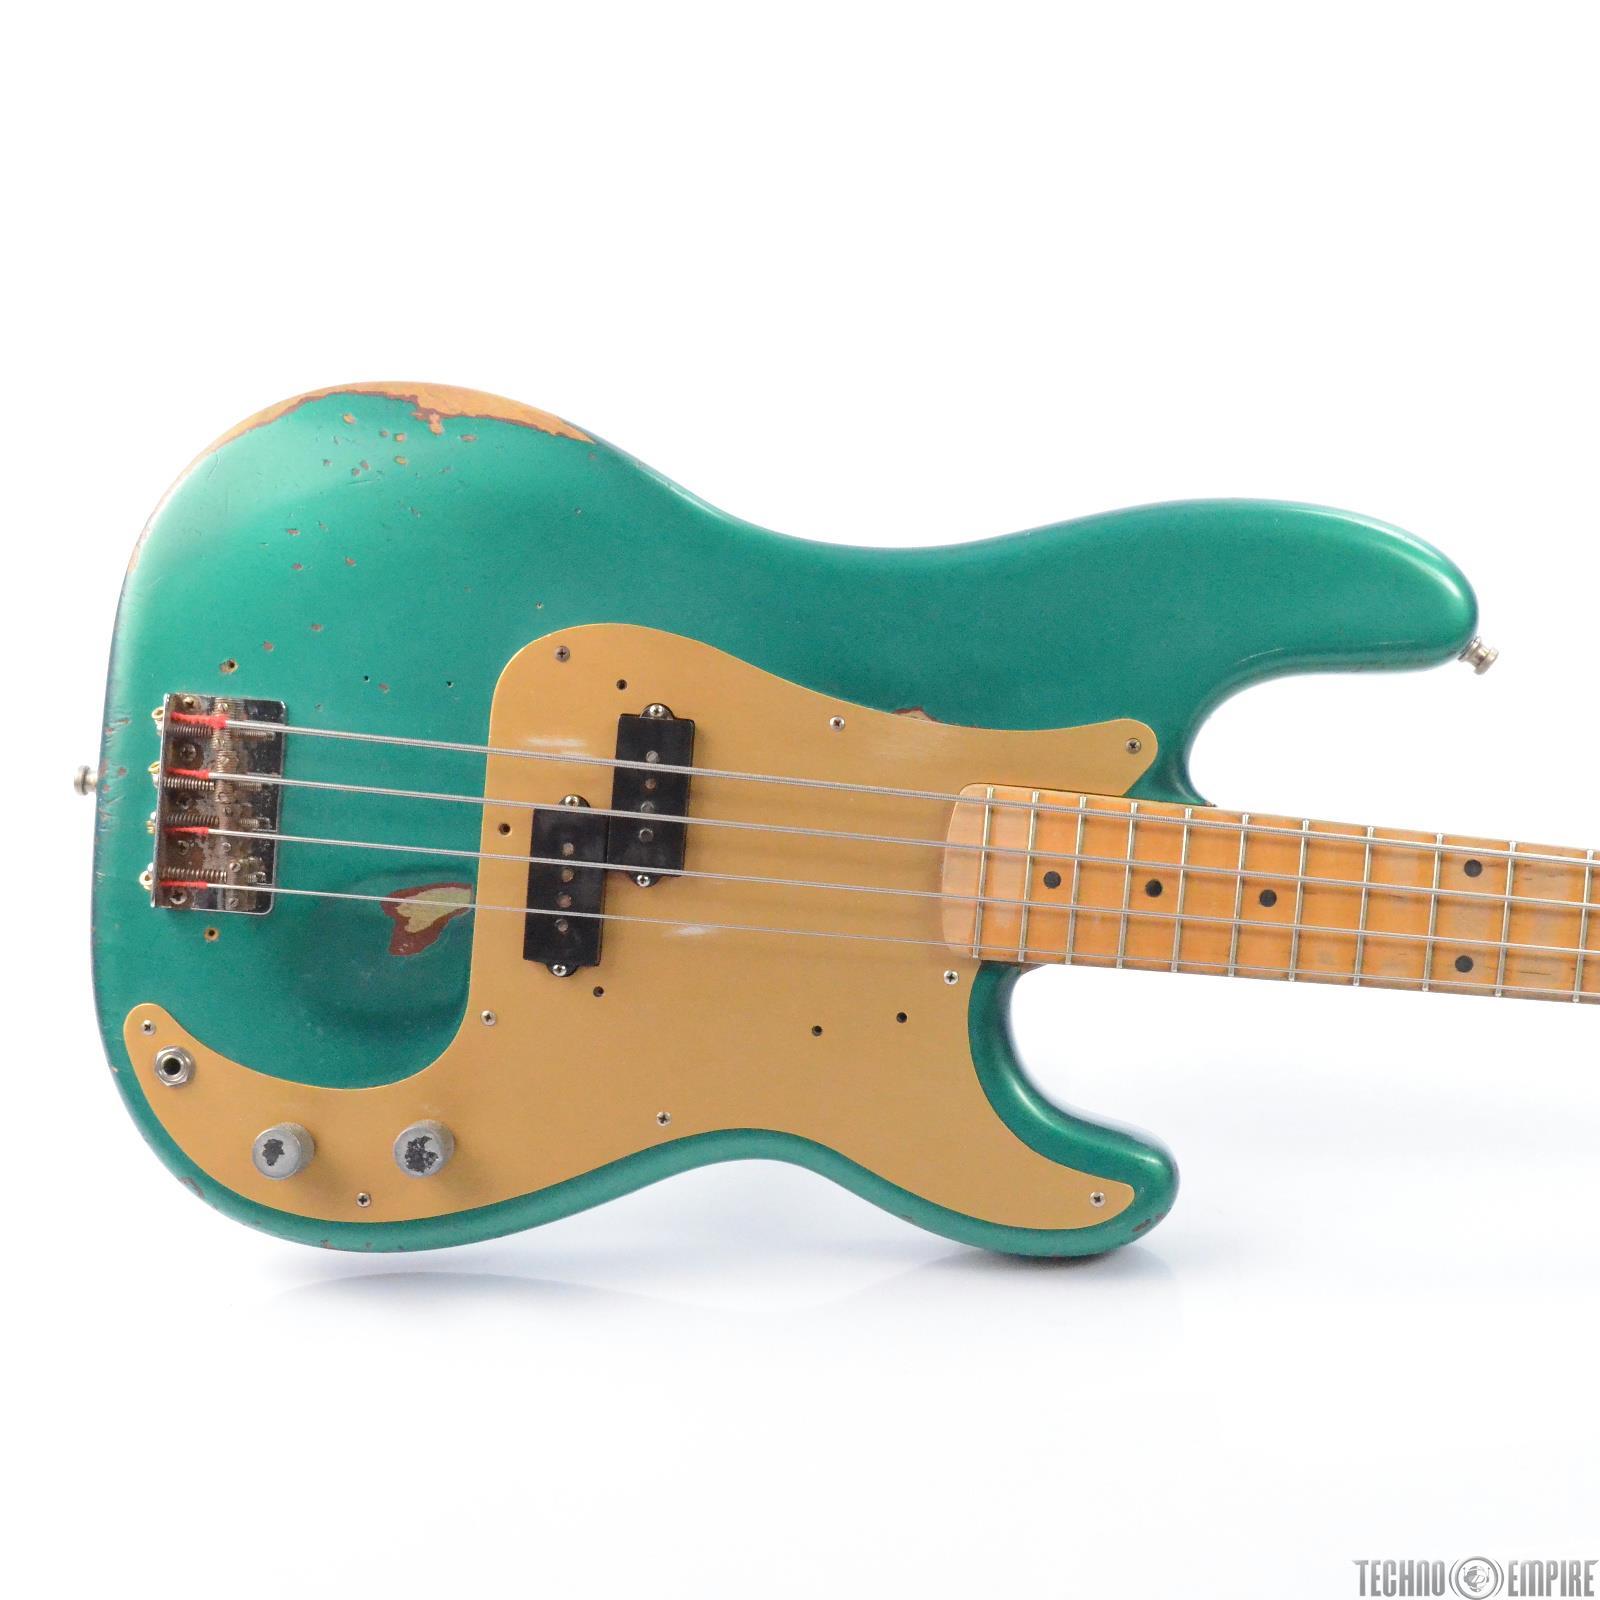 1958 Fender Precision P Bass Guitar w/ Case American Owned by Matt ...